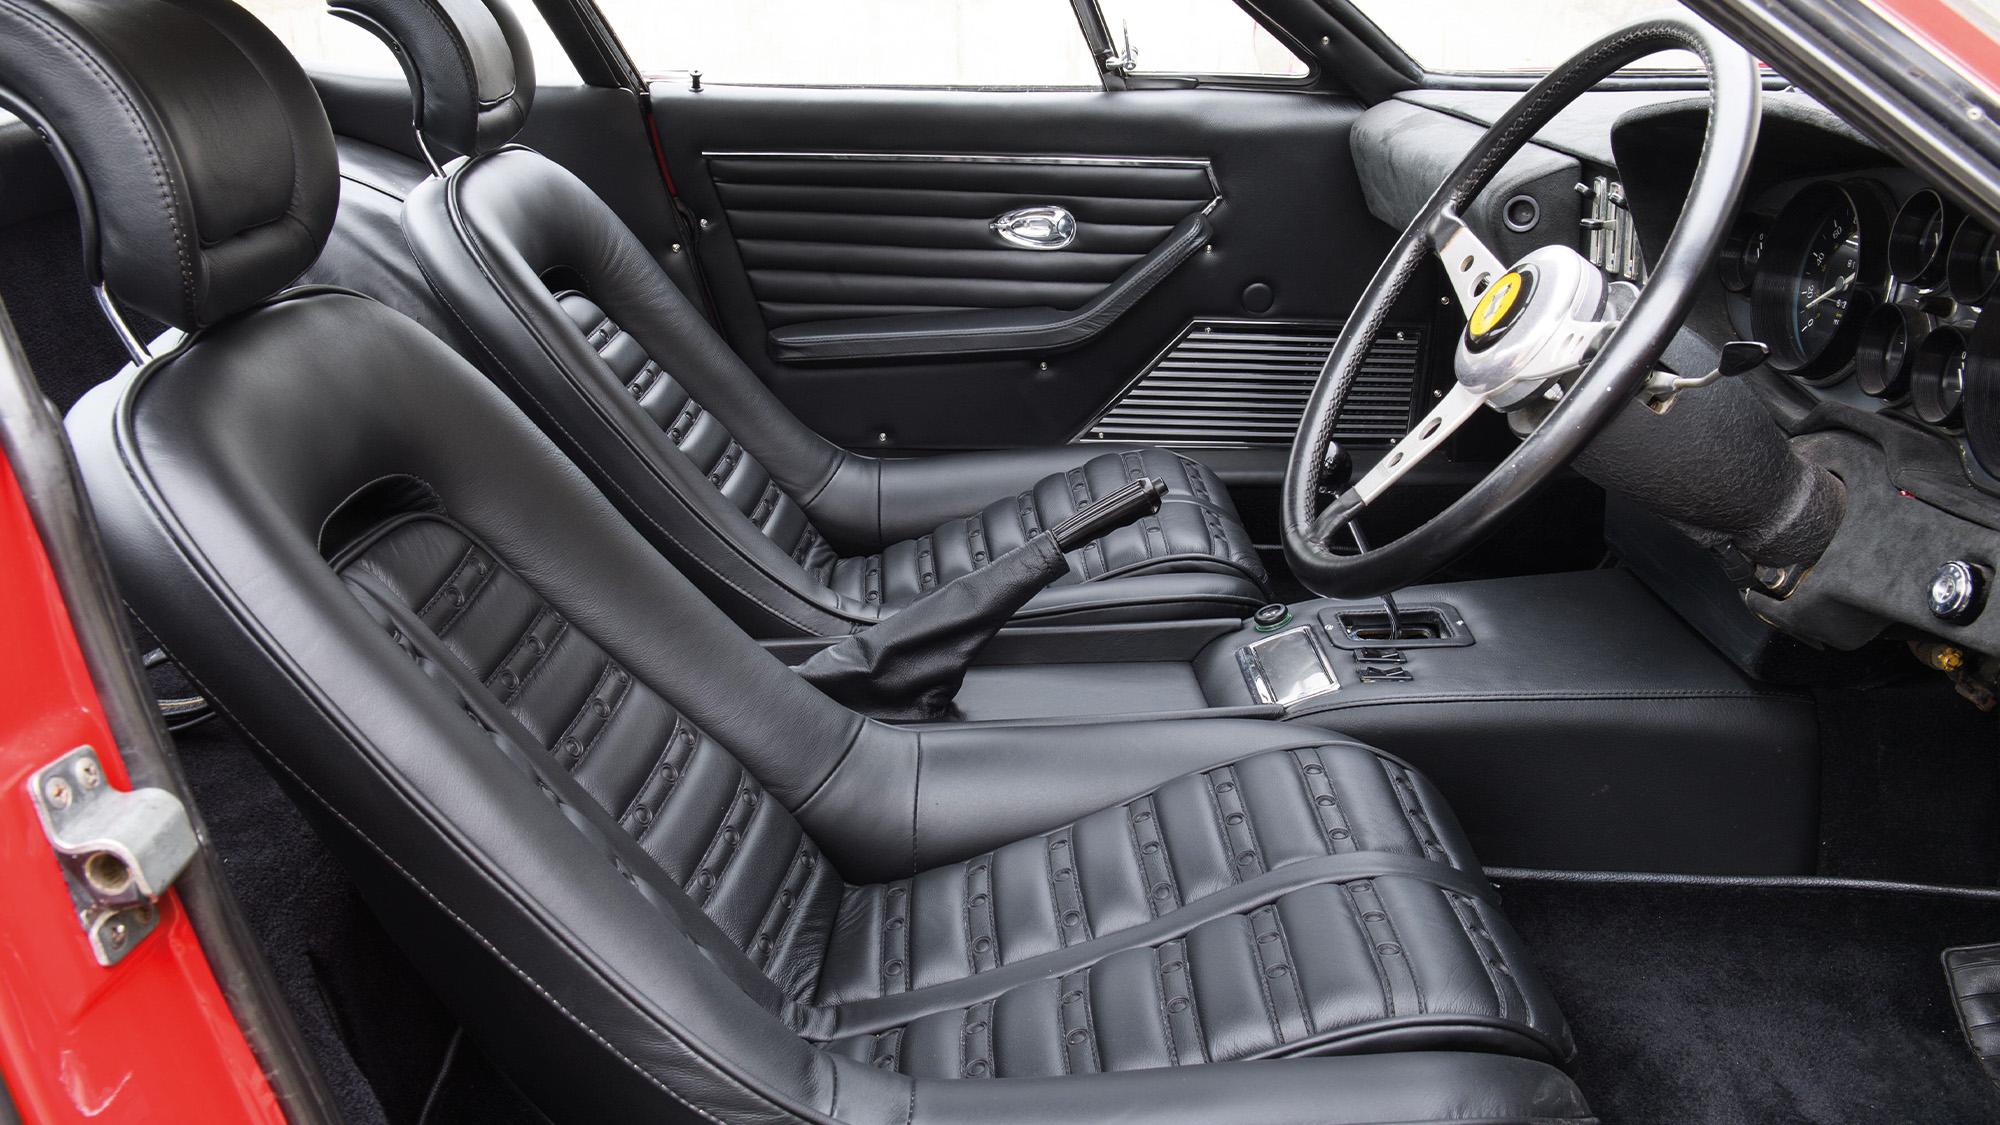 Ferrari Daytona interior